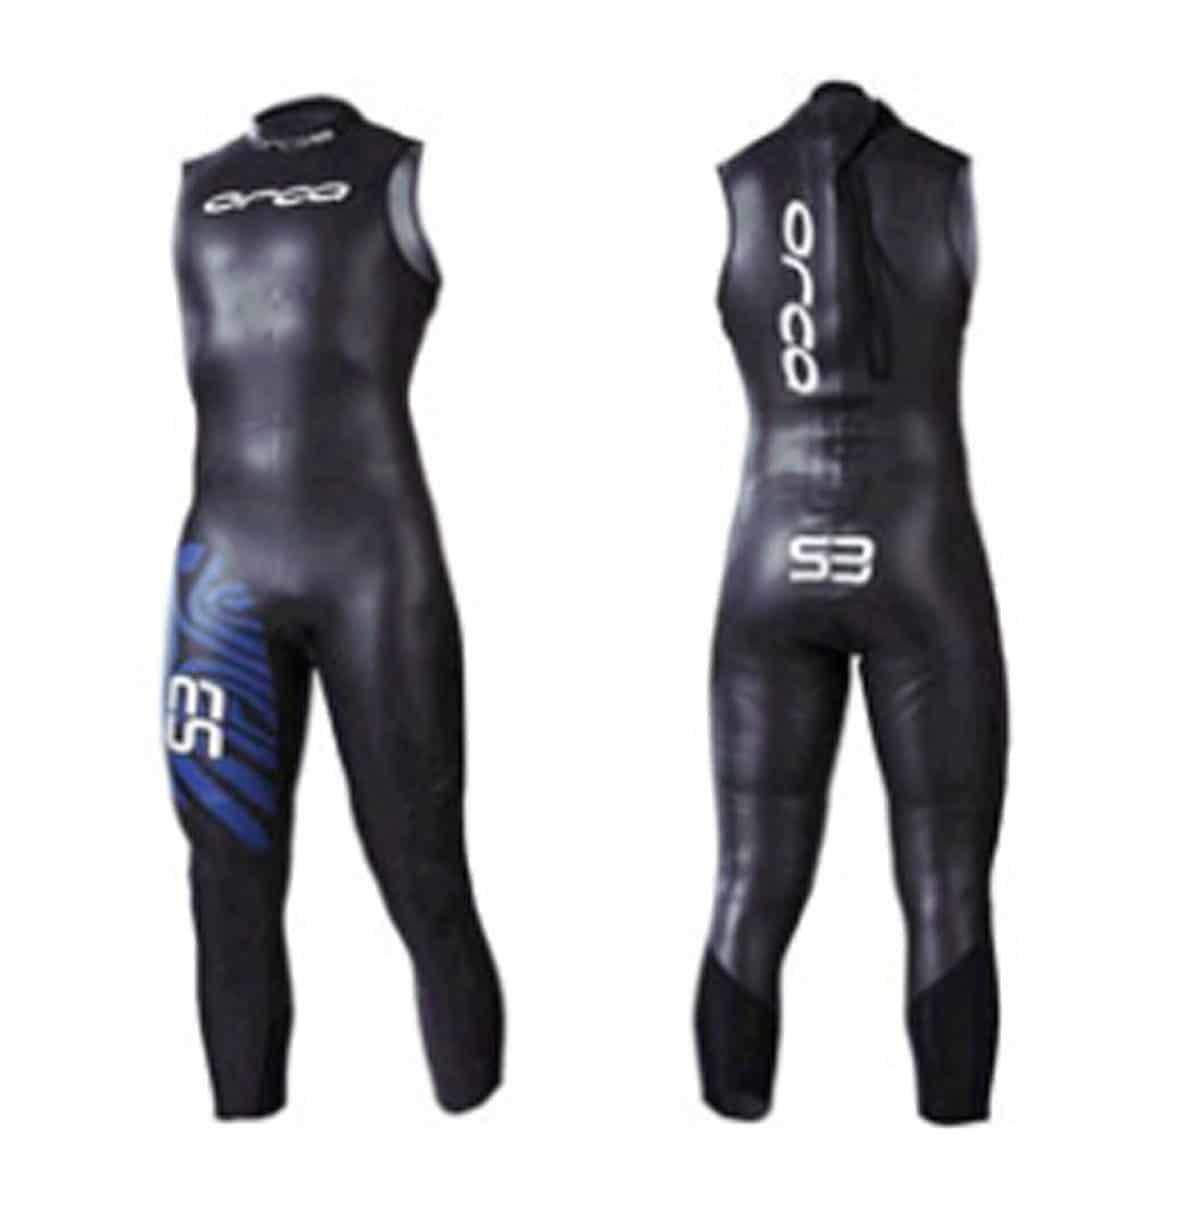 62dbae44f8 Orca Men s S3 Sleeveless Triathlon Wetsuit- Size 4 ONLY